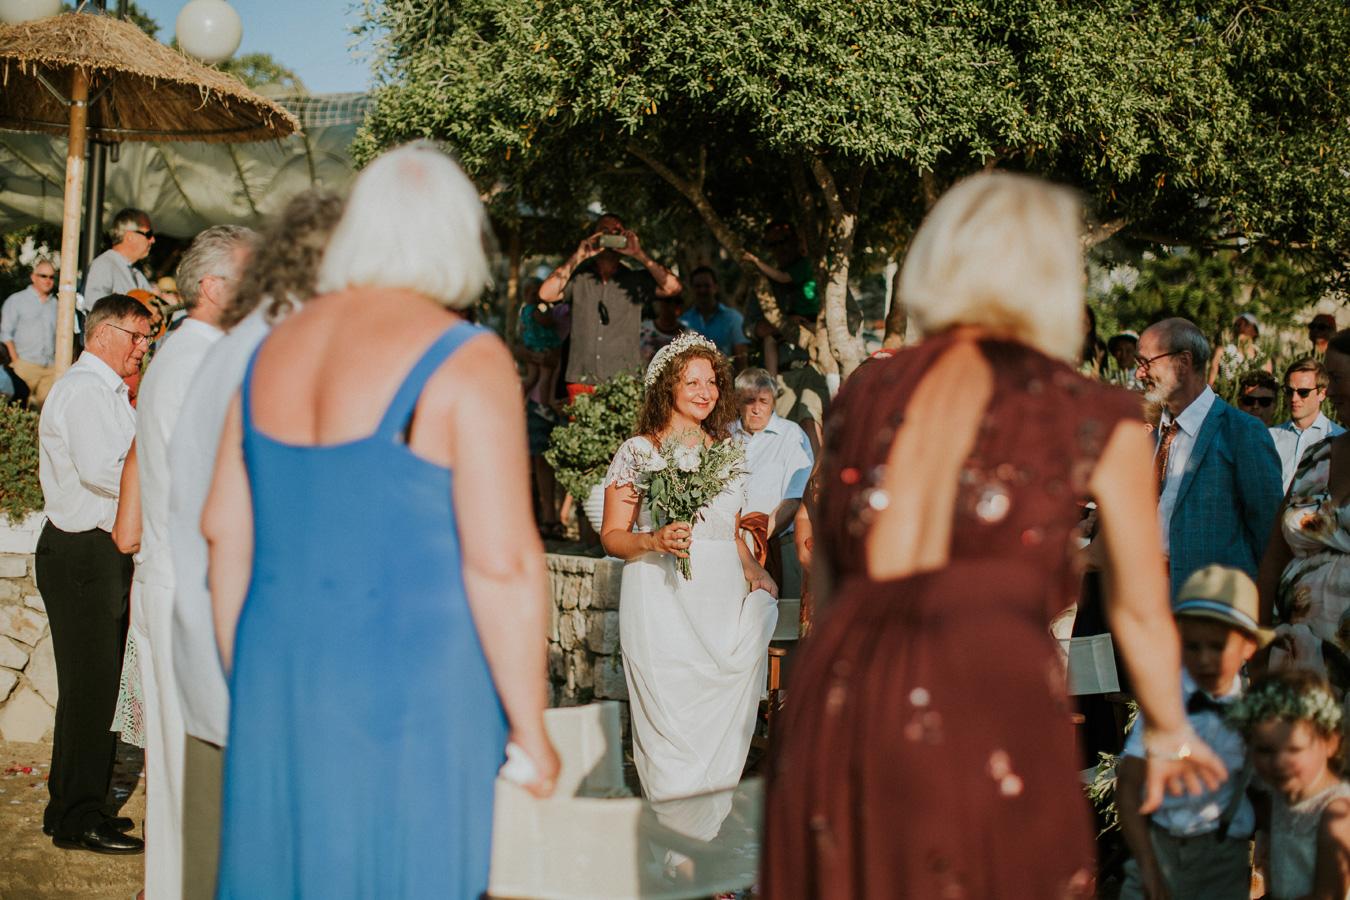 058-bryllupsfotograf-oslo-destinasjonsbryllup-fotograf-tone-tvedt.jpg